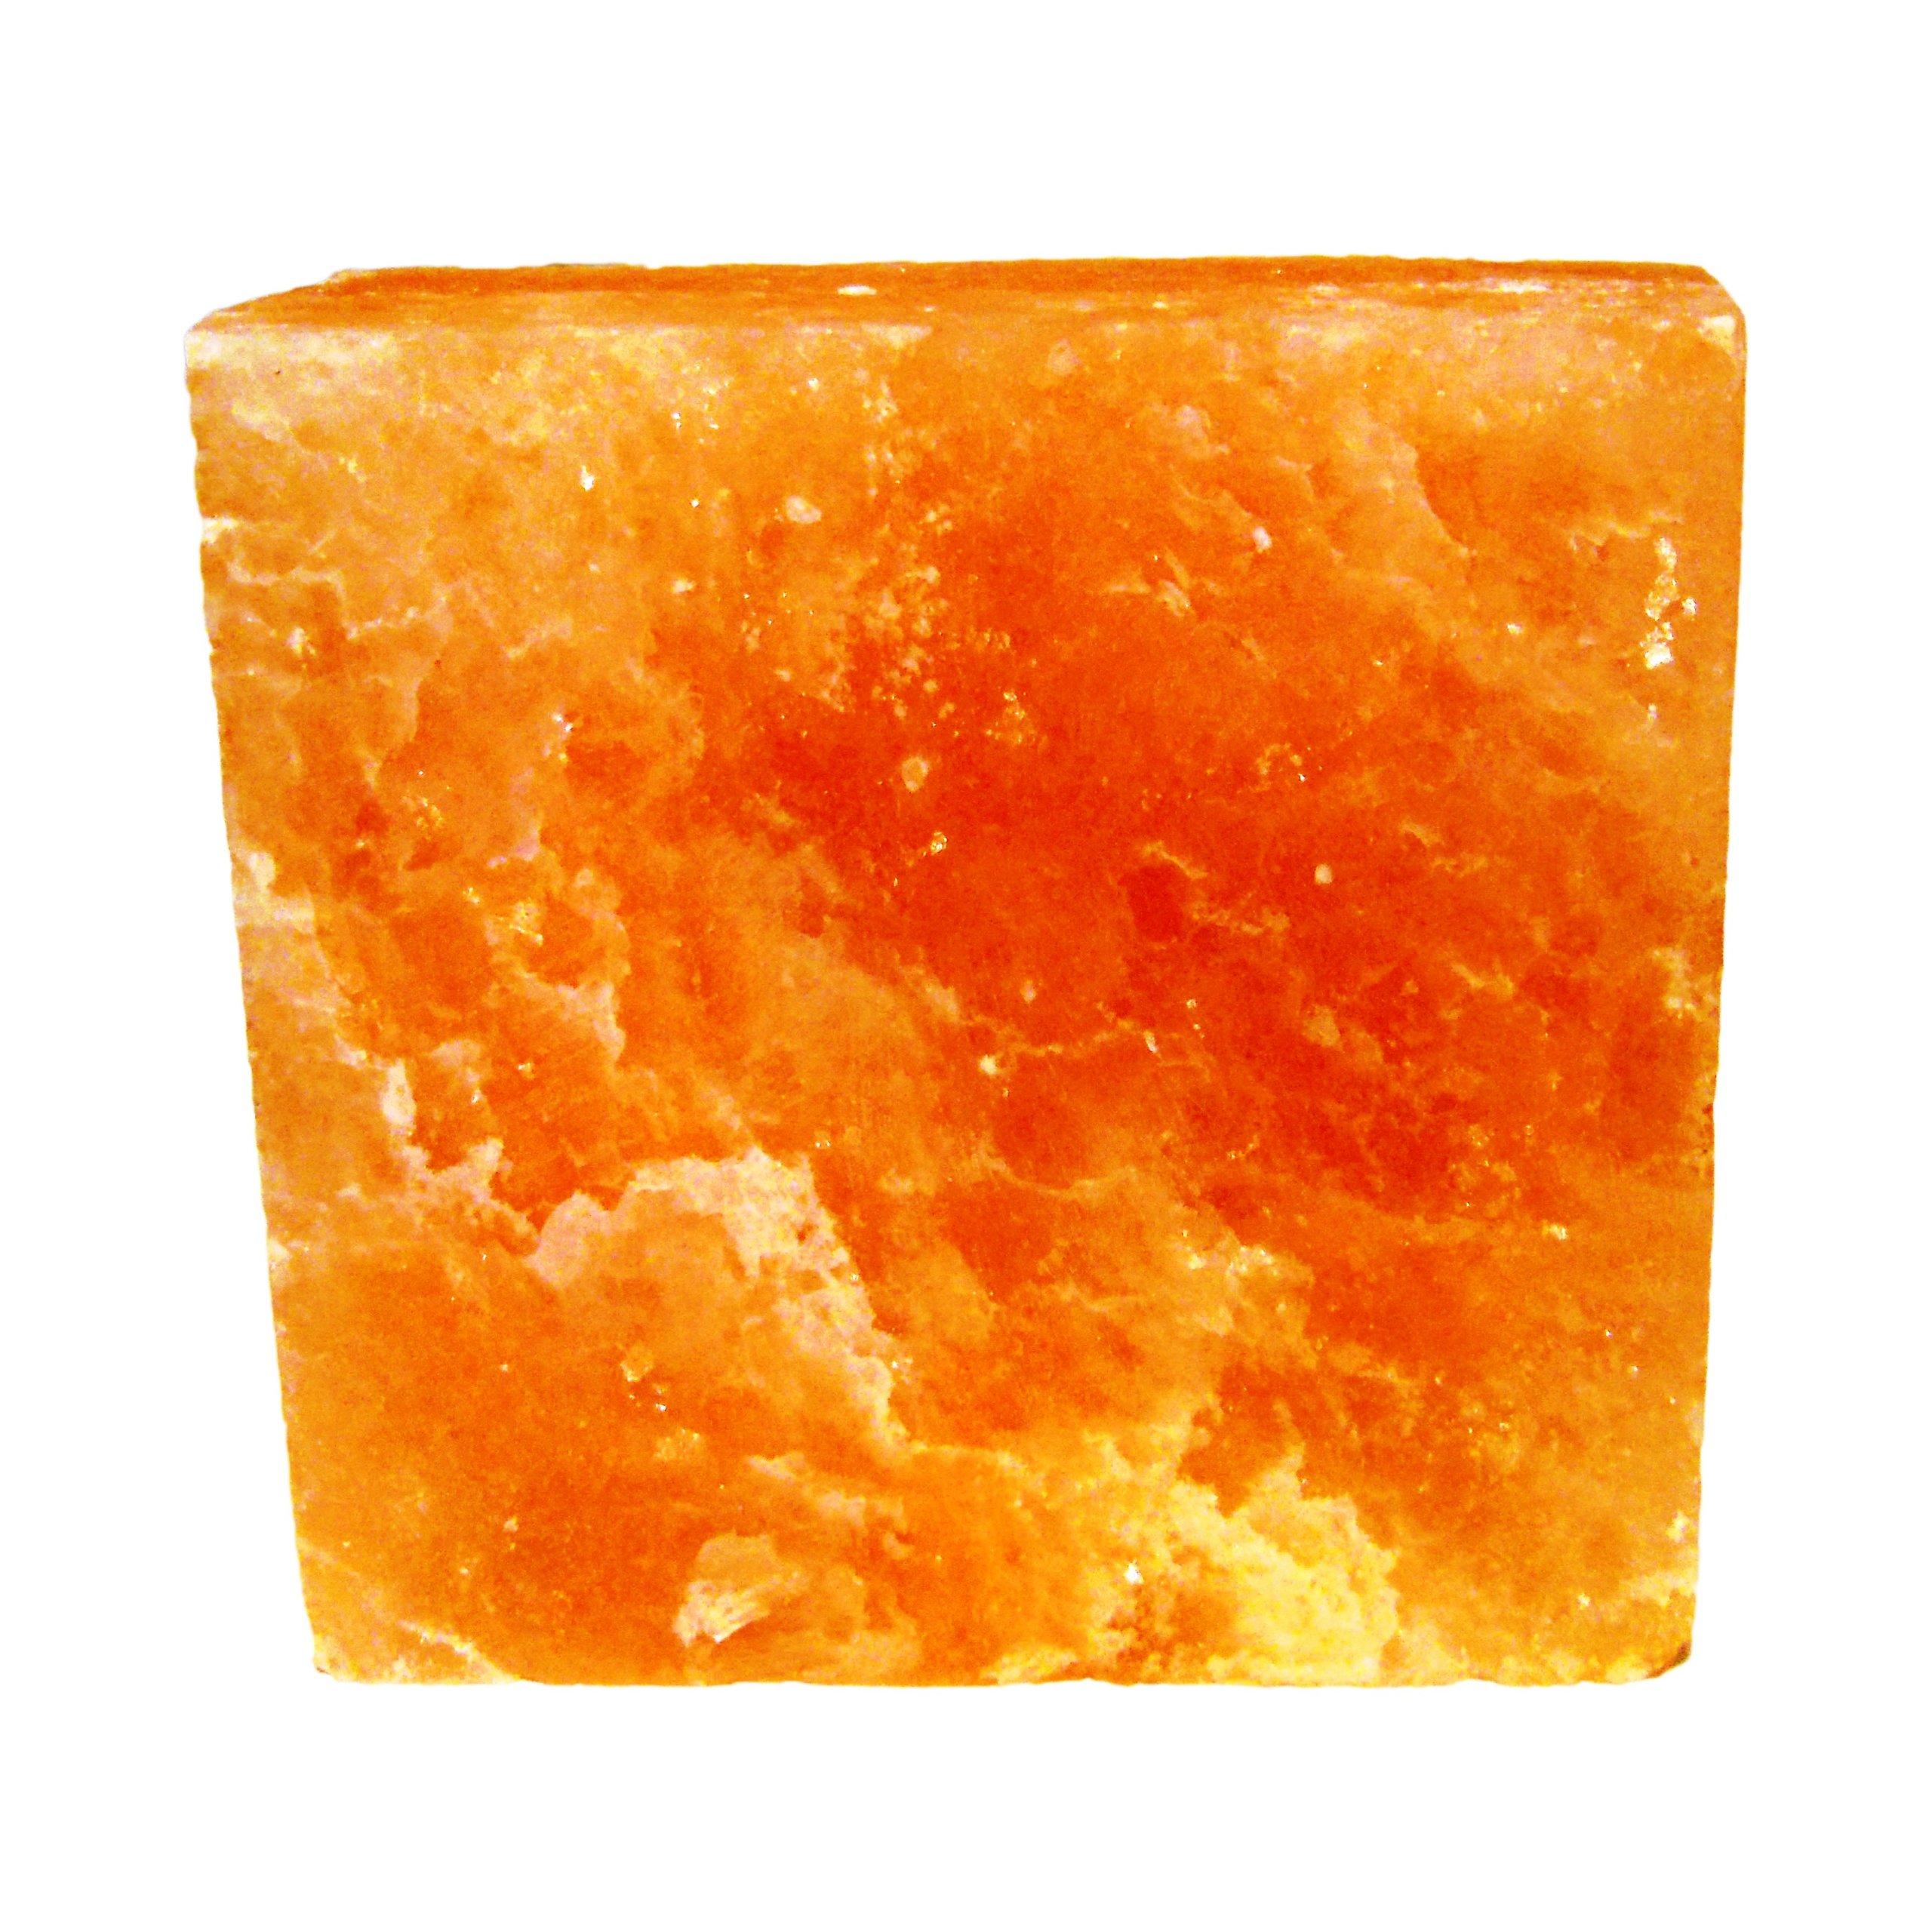 Natural Himalayan Salt Plate / Slab / Block Pink Square 8x8x2-Inch by SaltSkil (Image #3)